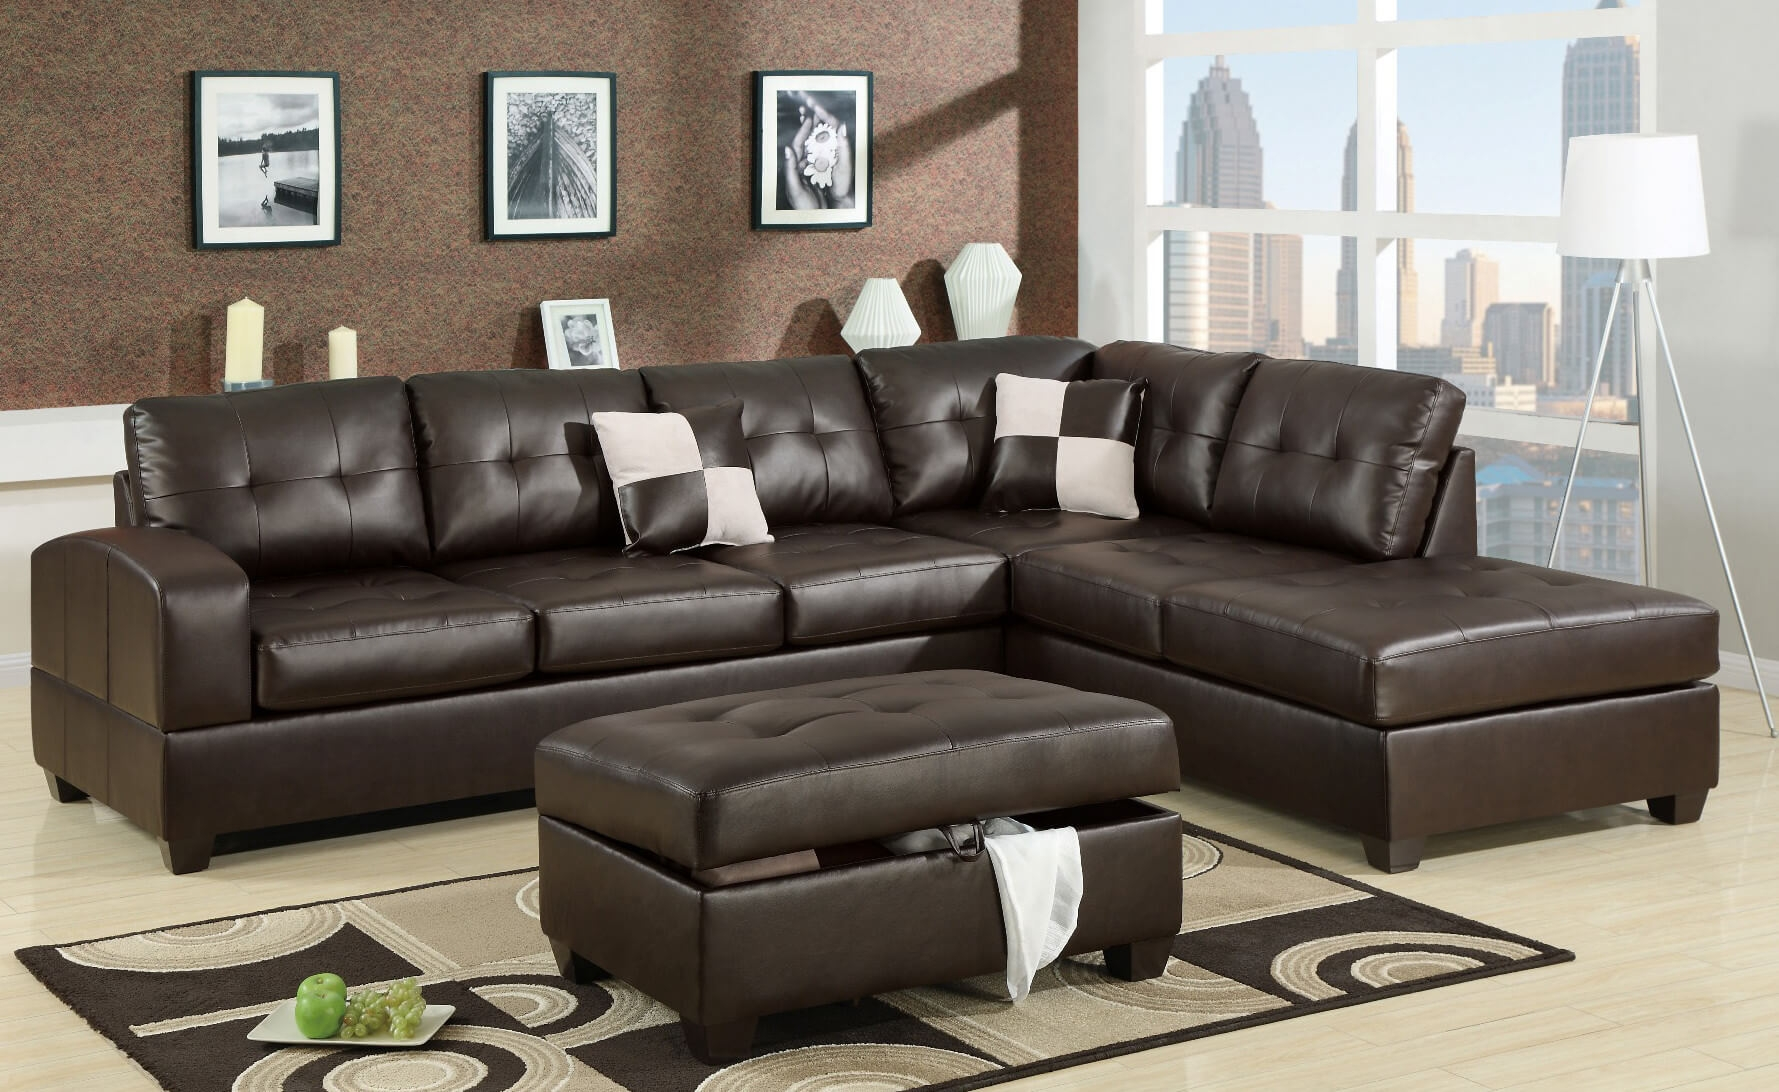 Eco Friendly Sectional Sofa Sofa Menzilperde Throughout Eco Friendly Sectional Sofa (#9 of 12)